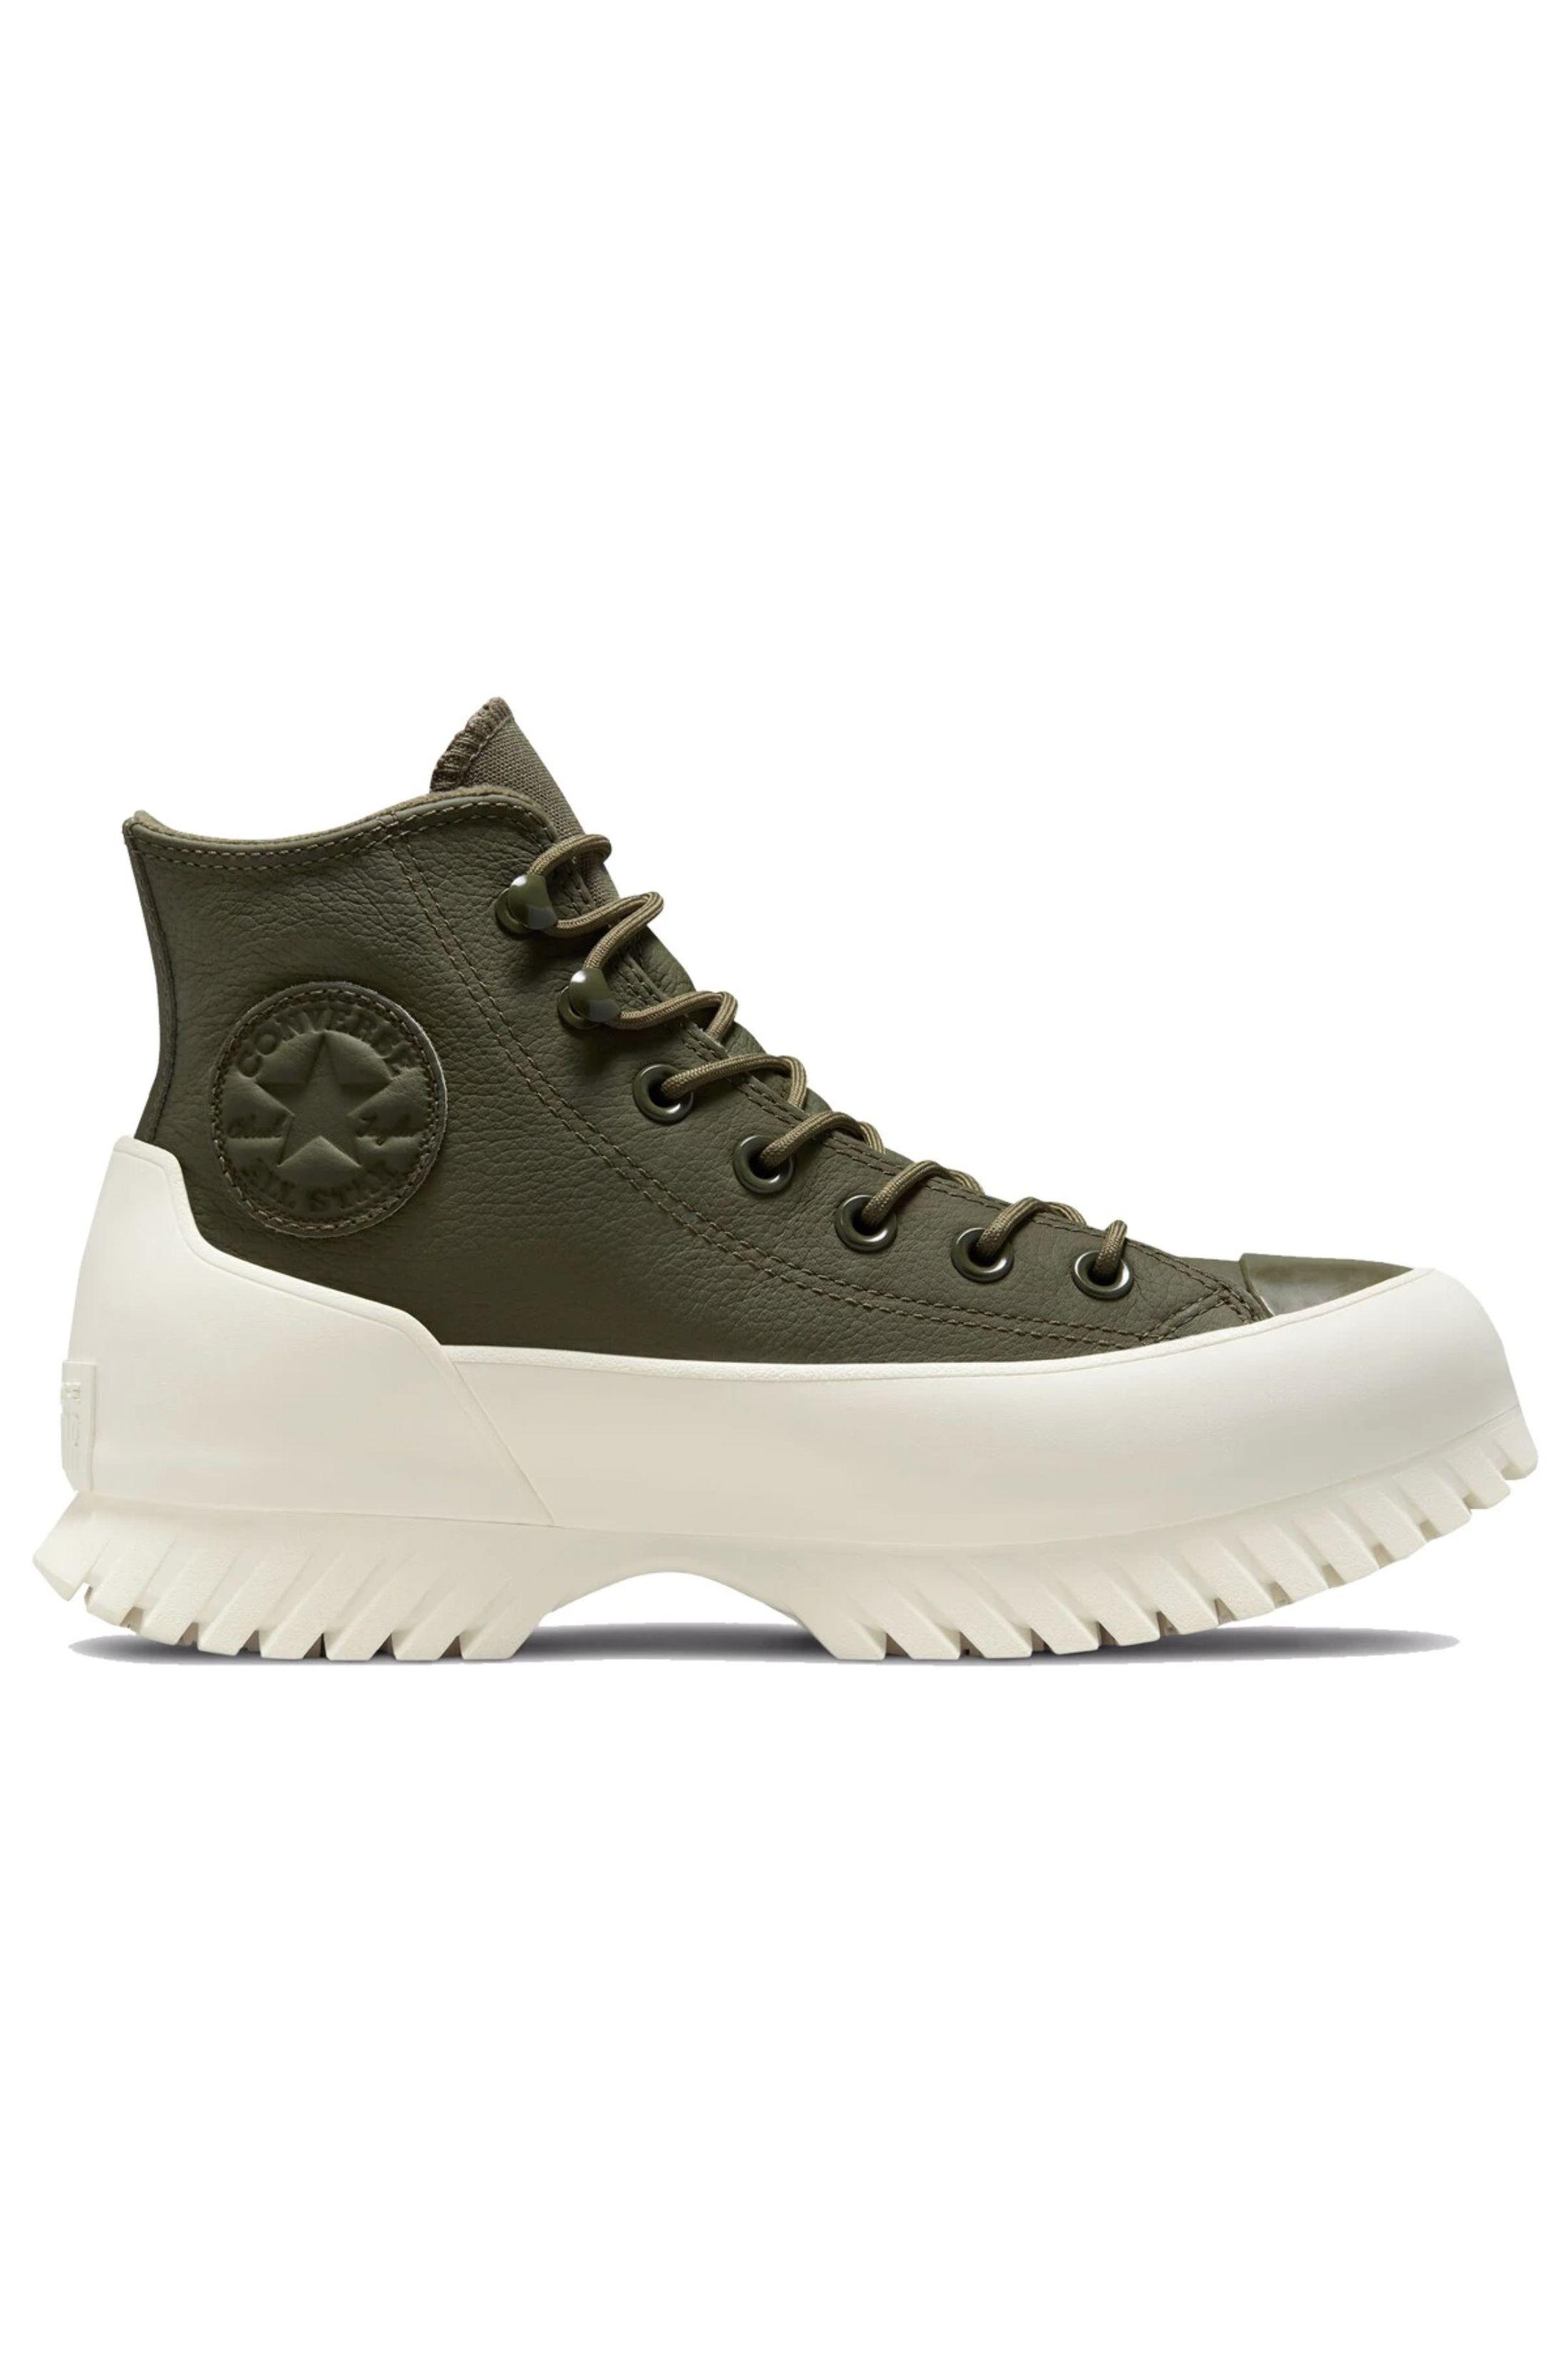 Converse Shoes CHUCK TAYLOR ALL STAR LUGGED WINTER 2.0 HI Cargo Khaki/Bold Mandarin/Egret